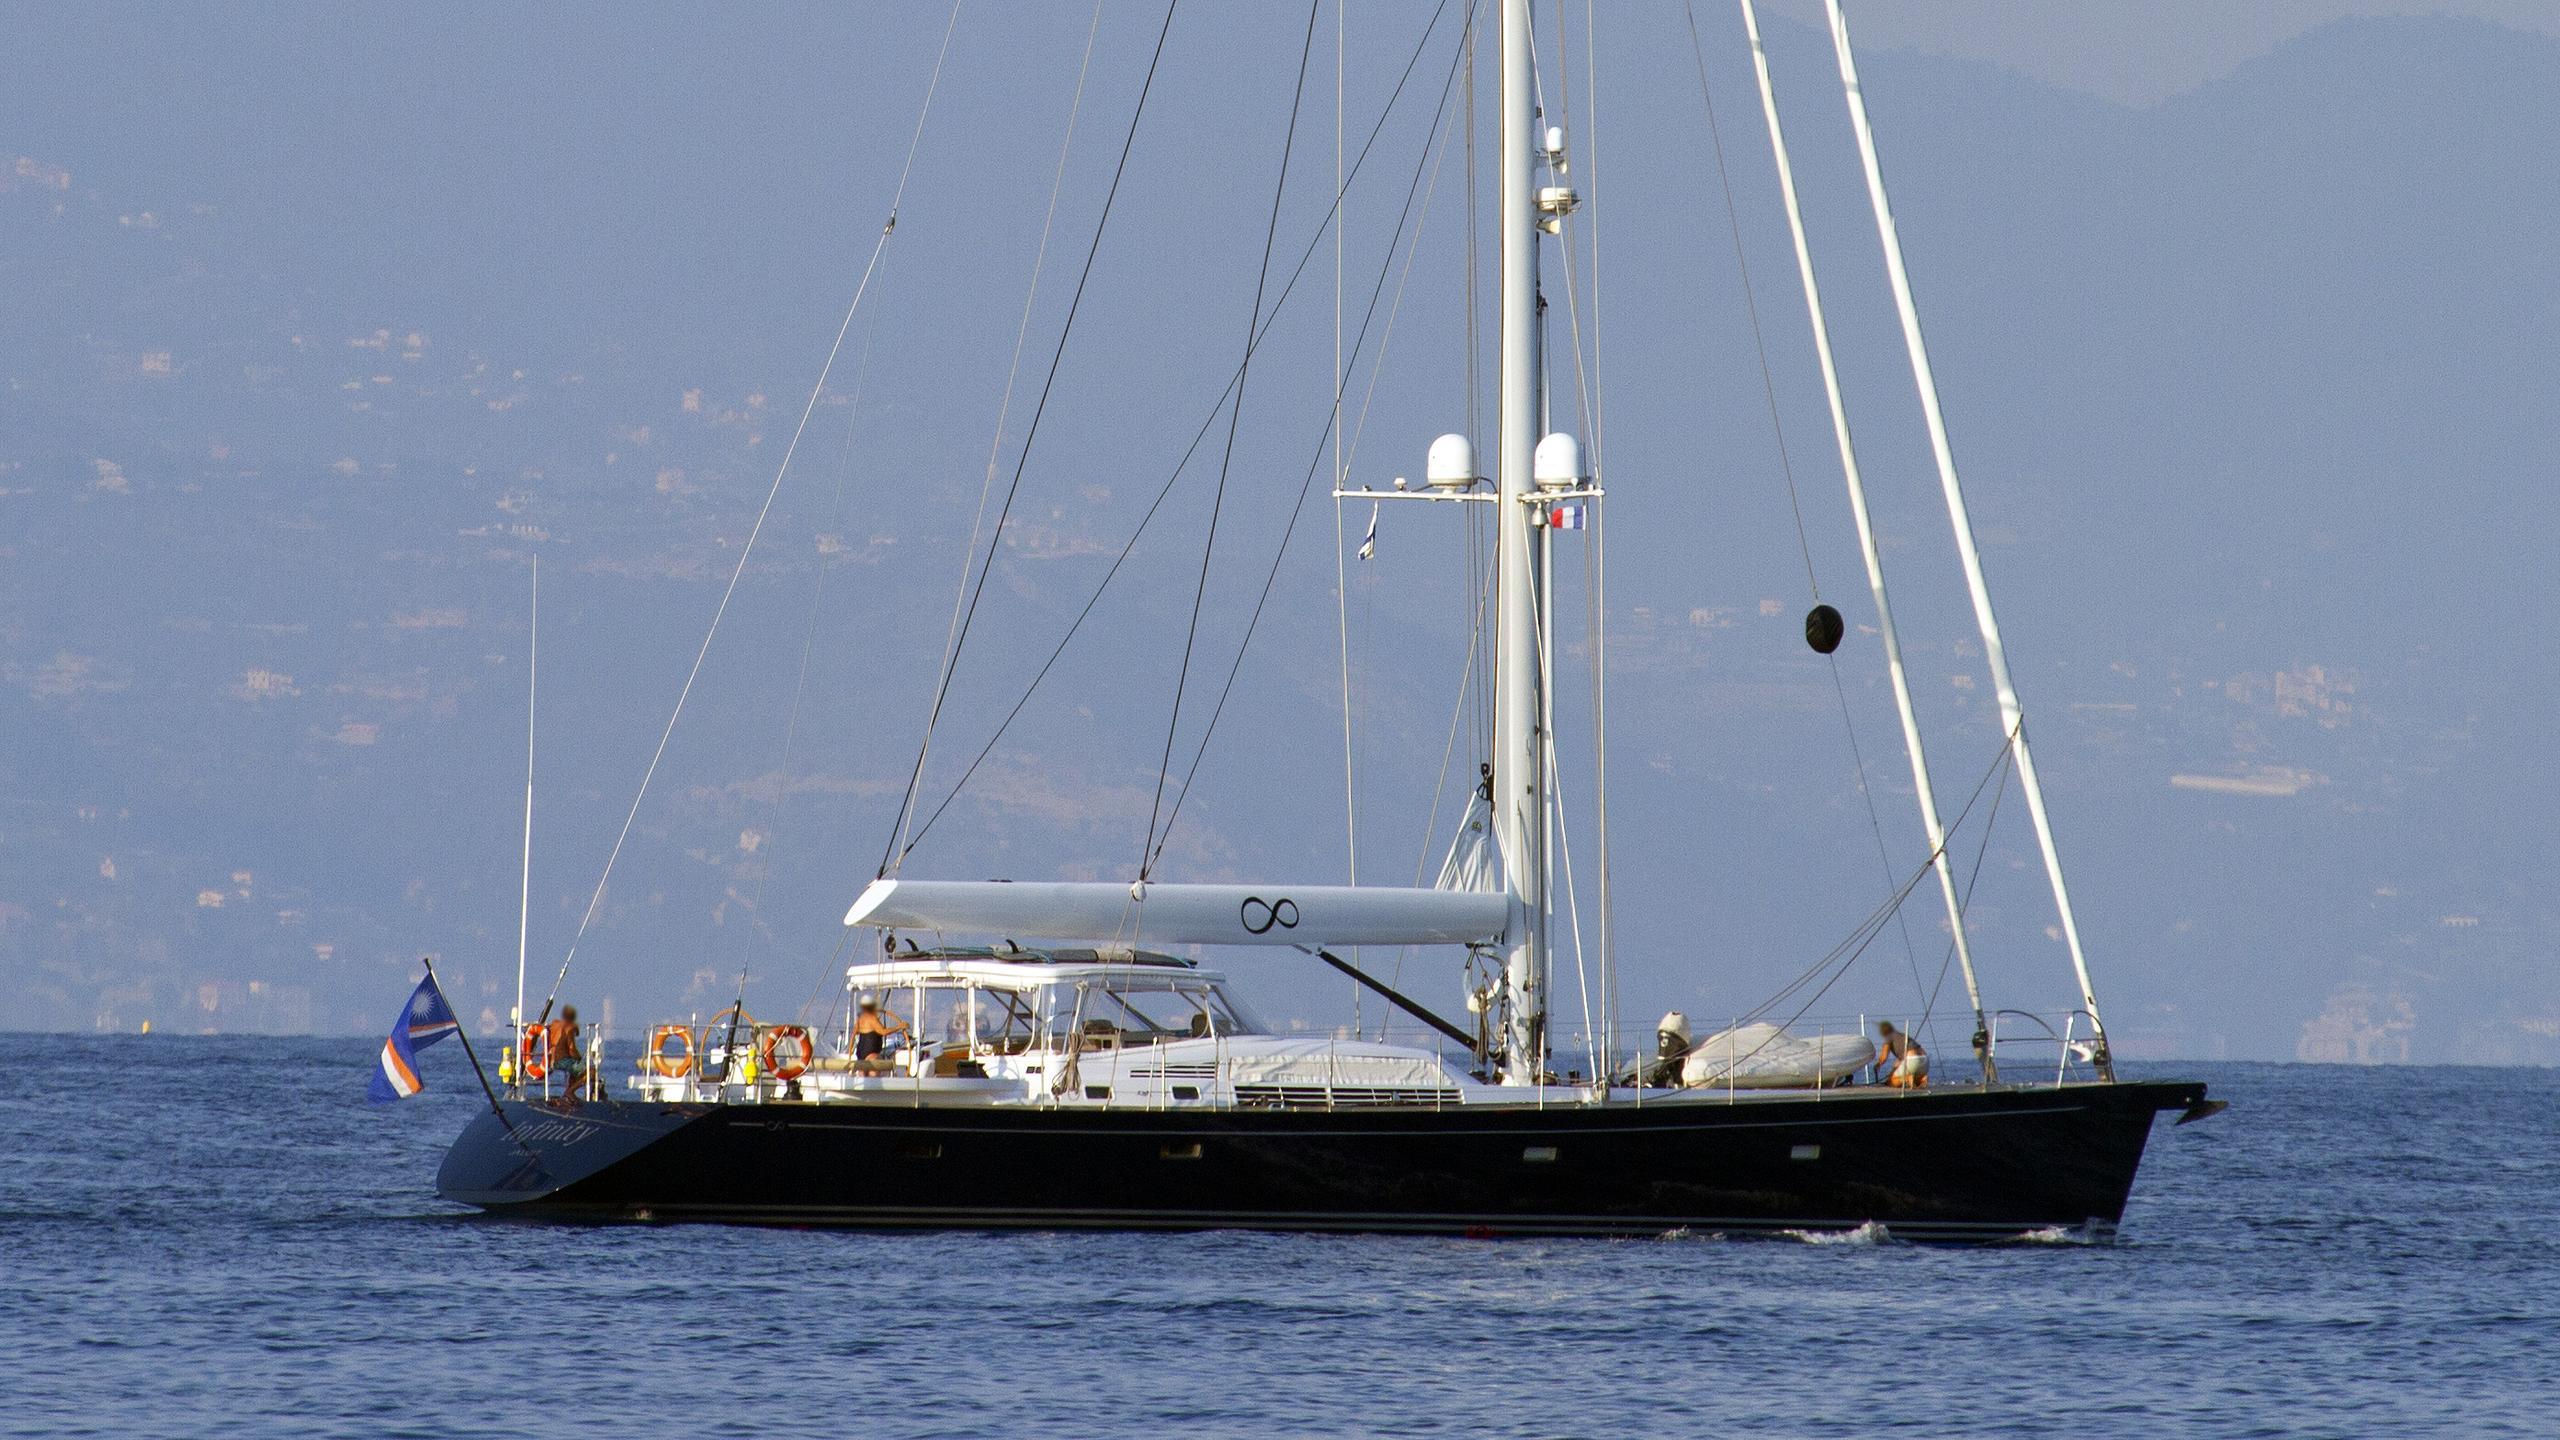 infinity-sailing-yacht-cnb-2008-29m-running-half-stern